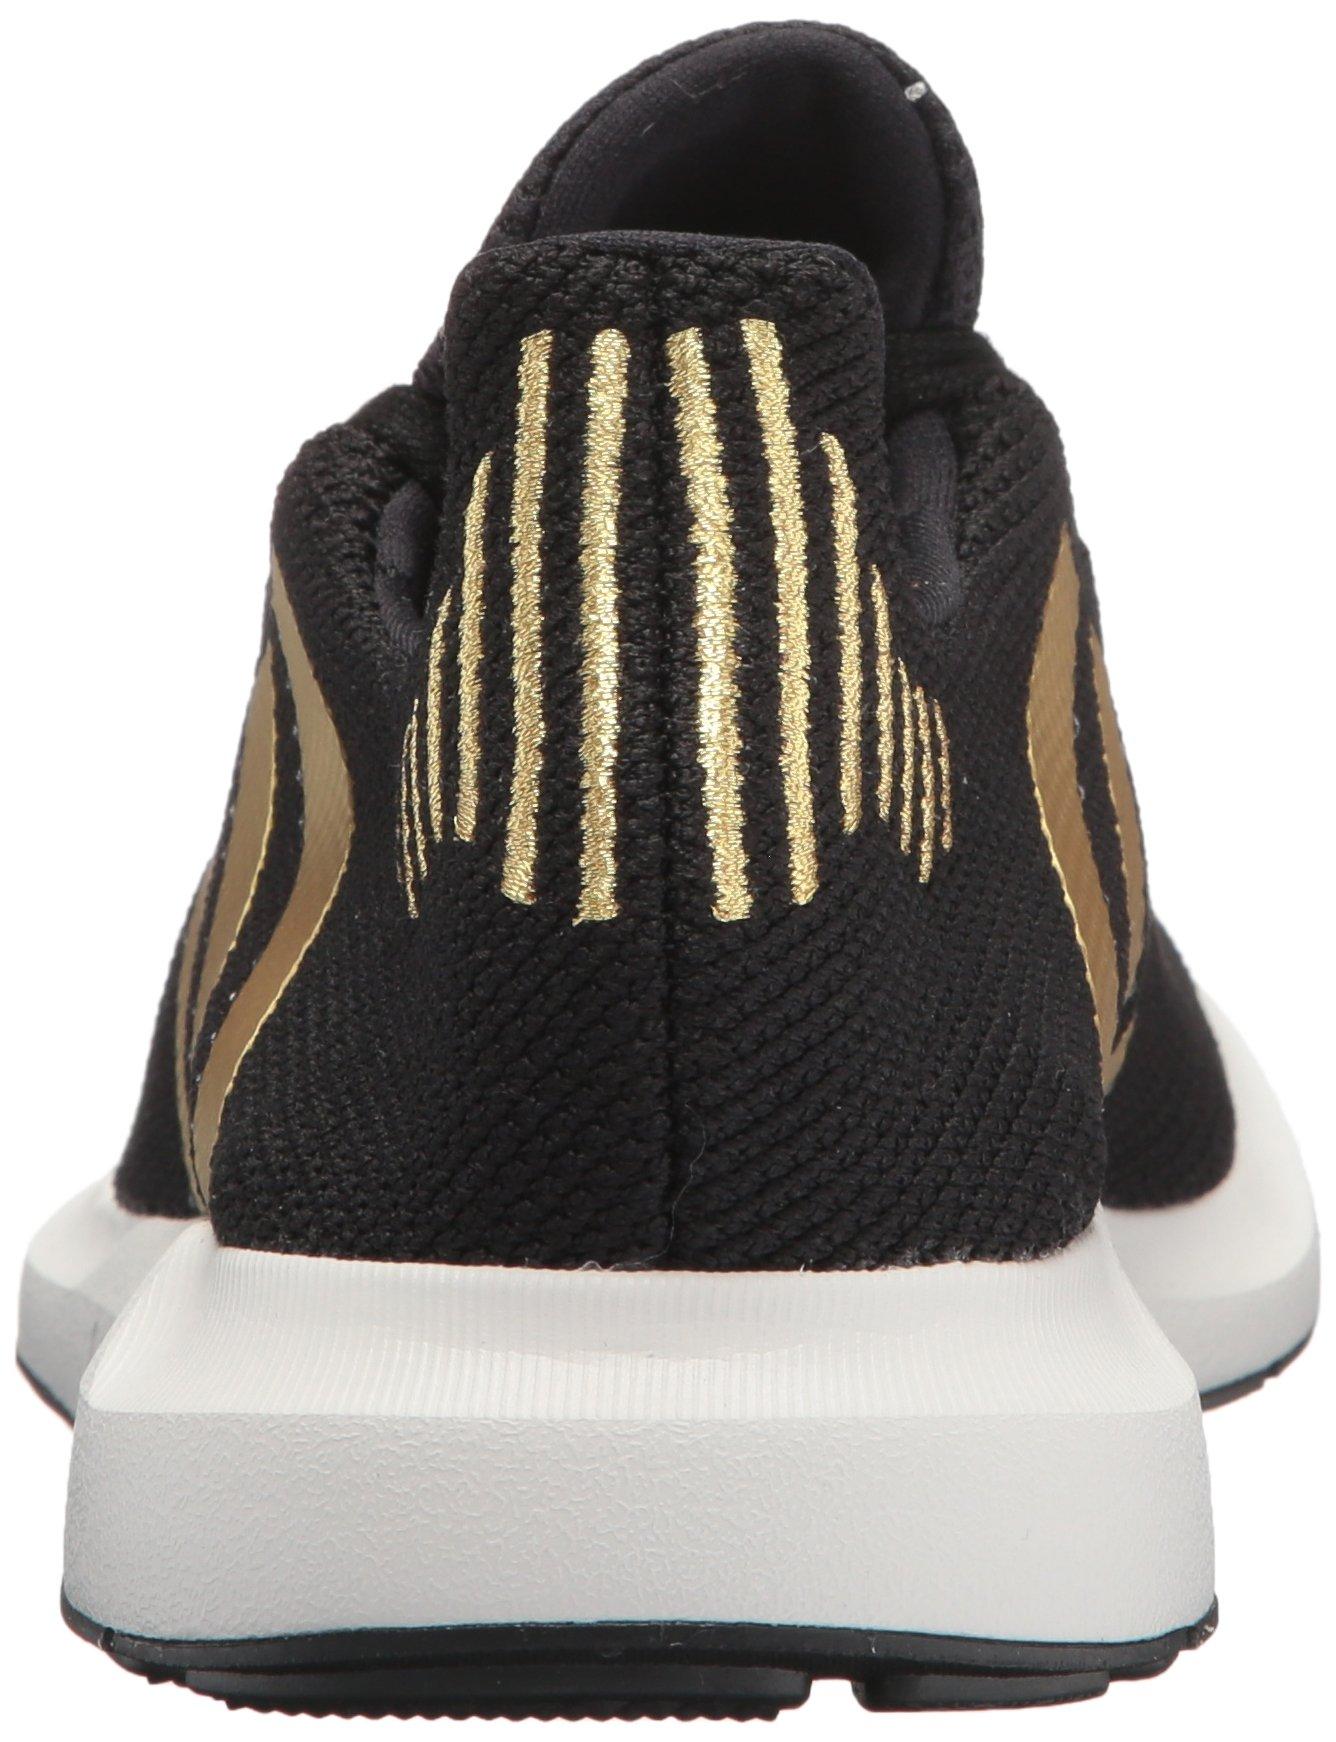 Adidas Swift Run Damen CG4145 Schwarz Gold Metallic Knit